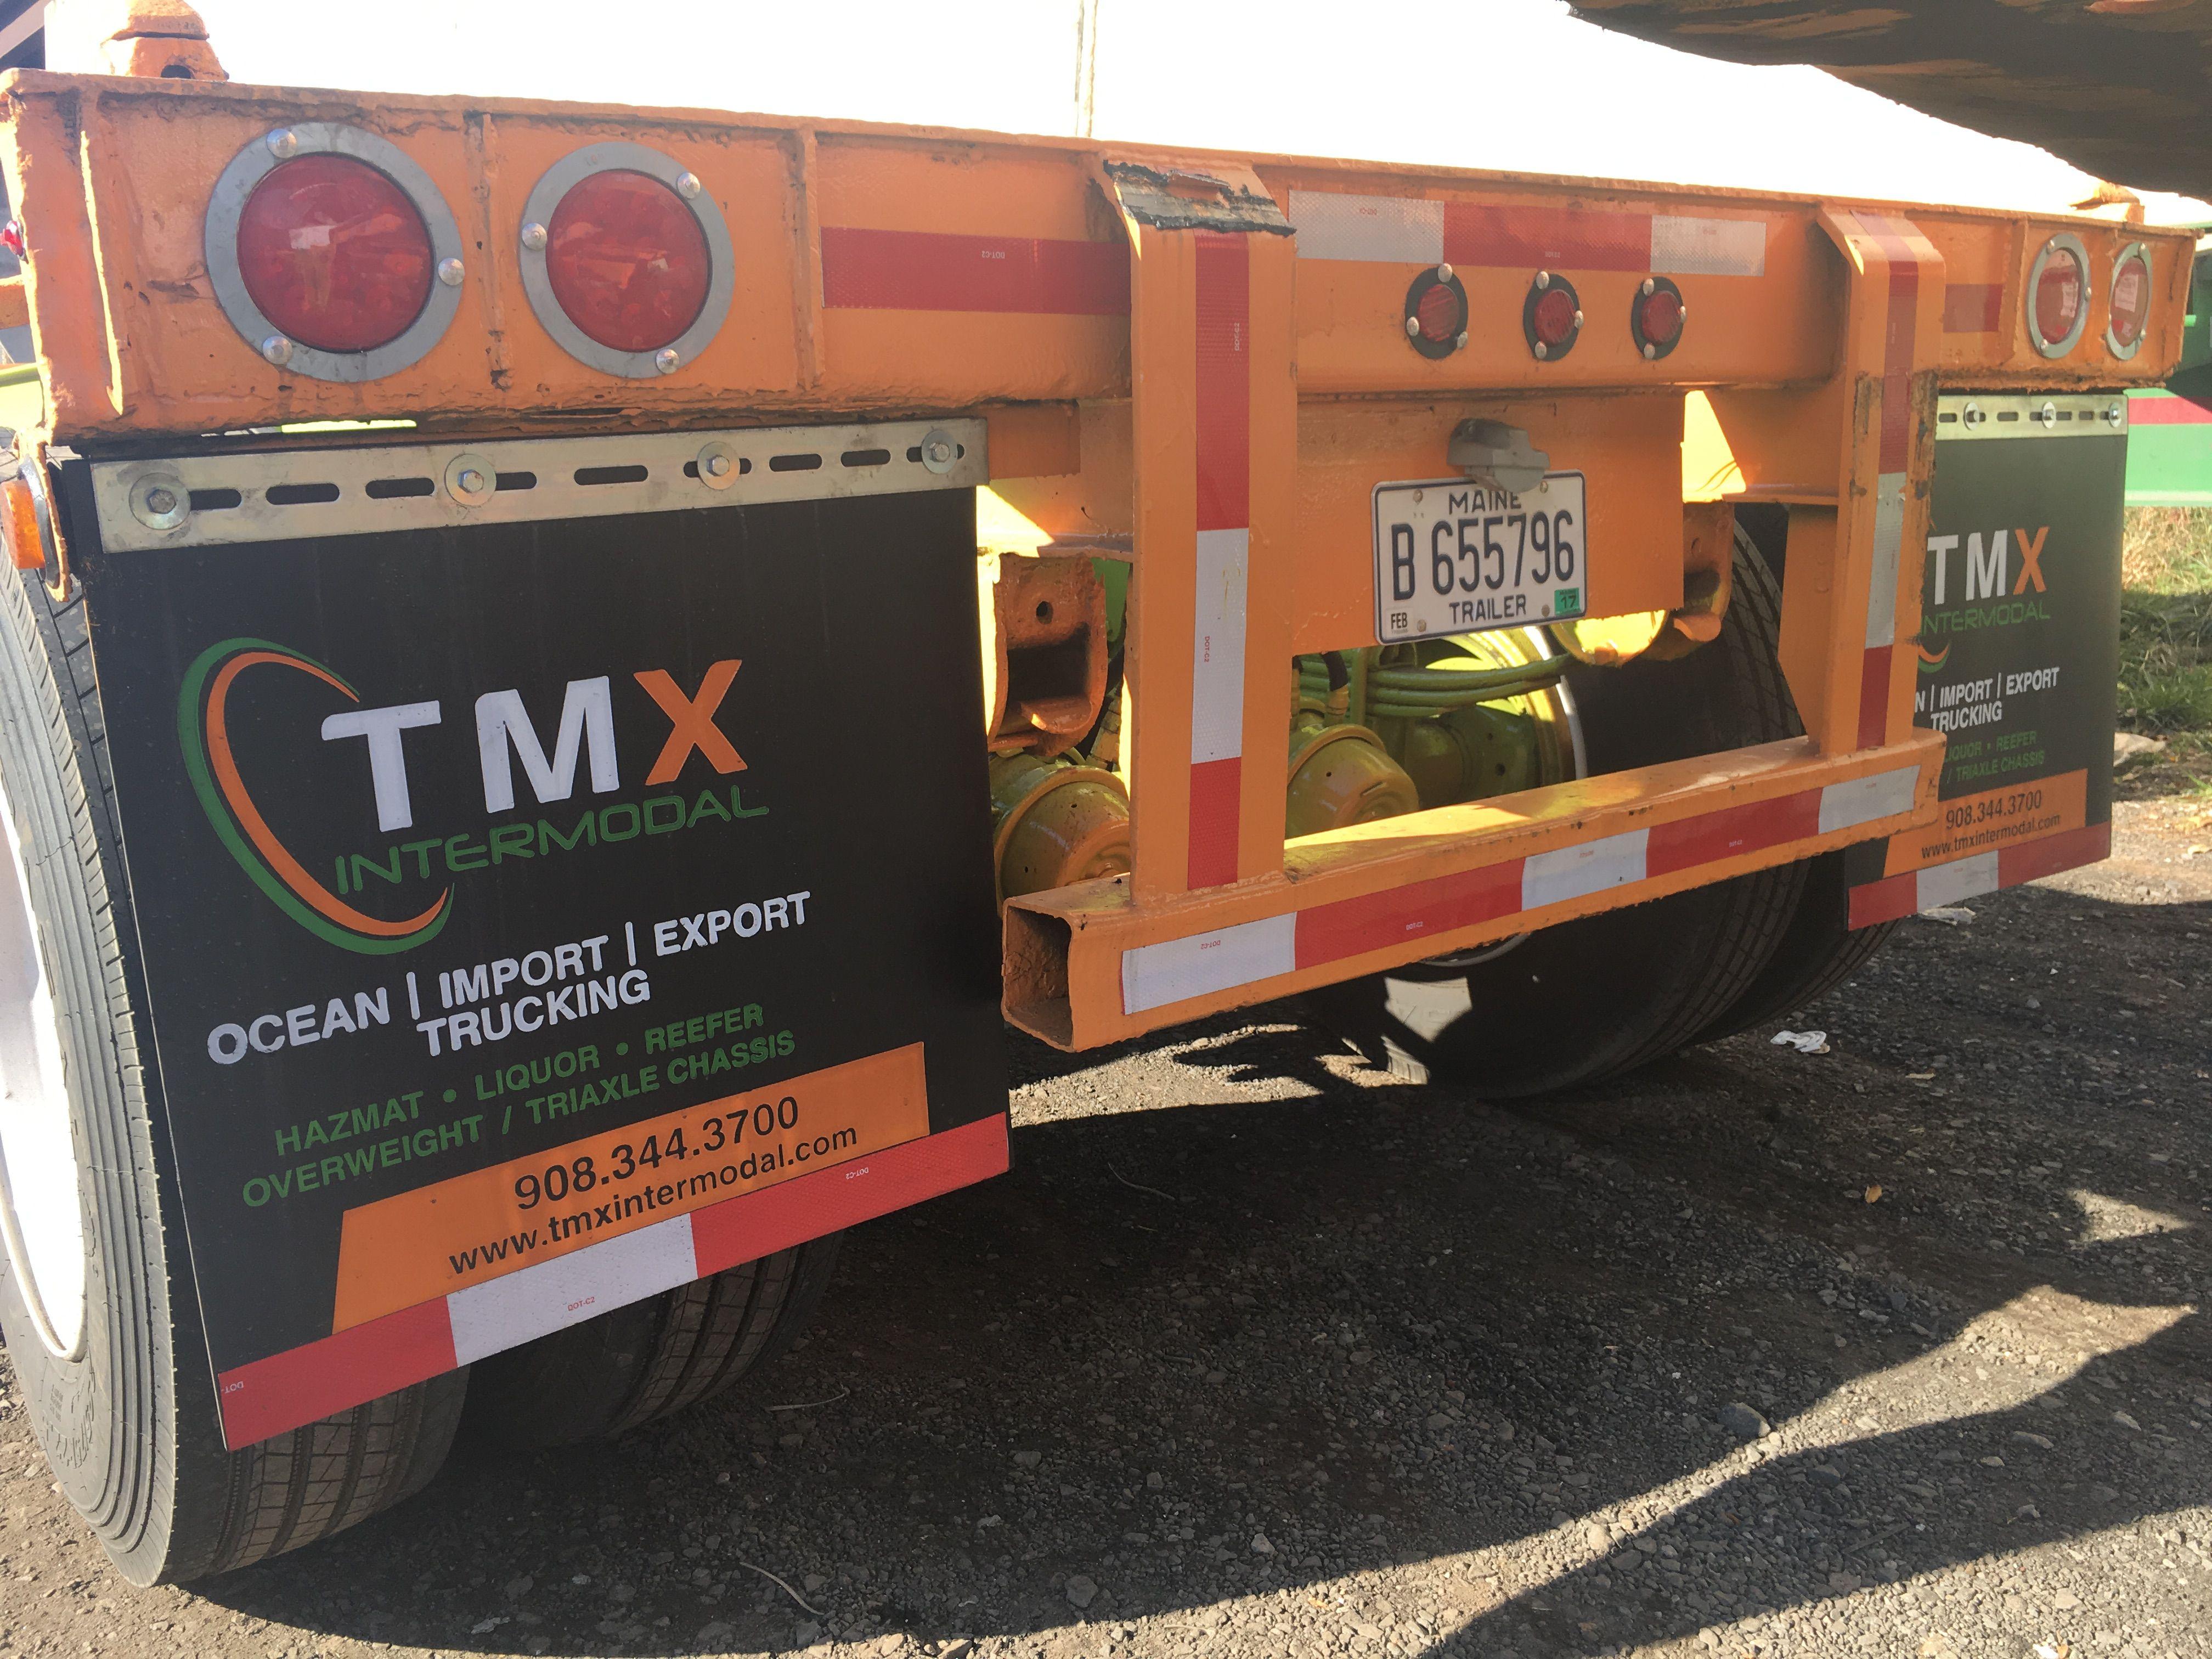 Tmx intermodal   Drayage service   Signs